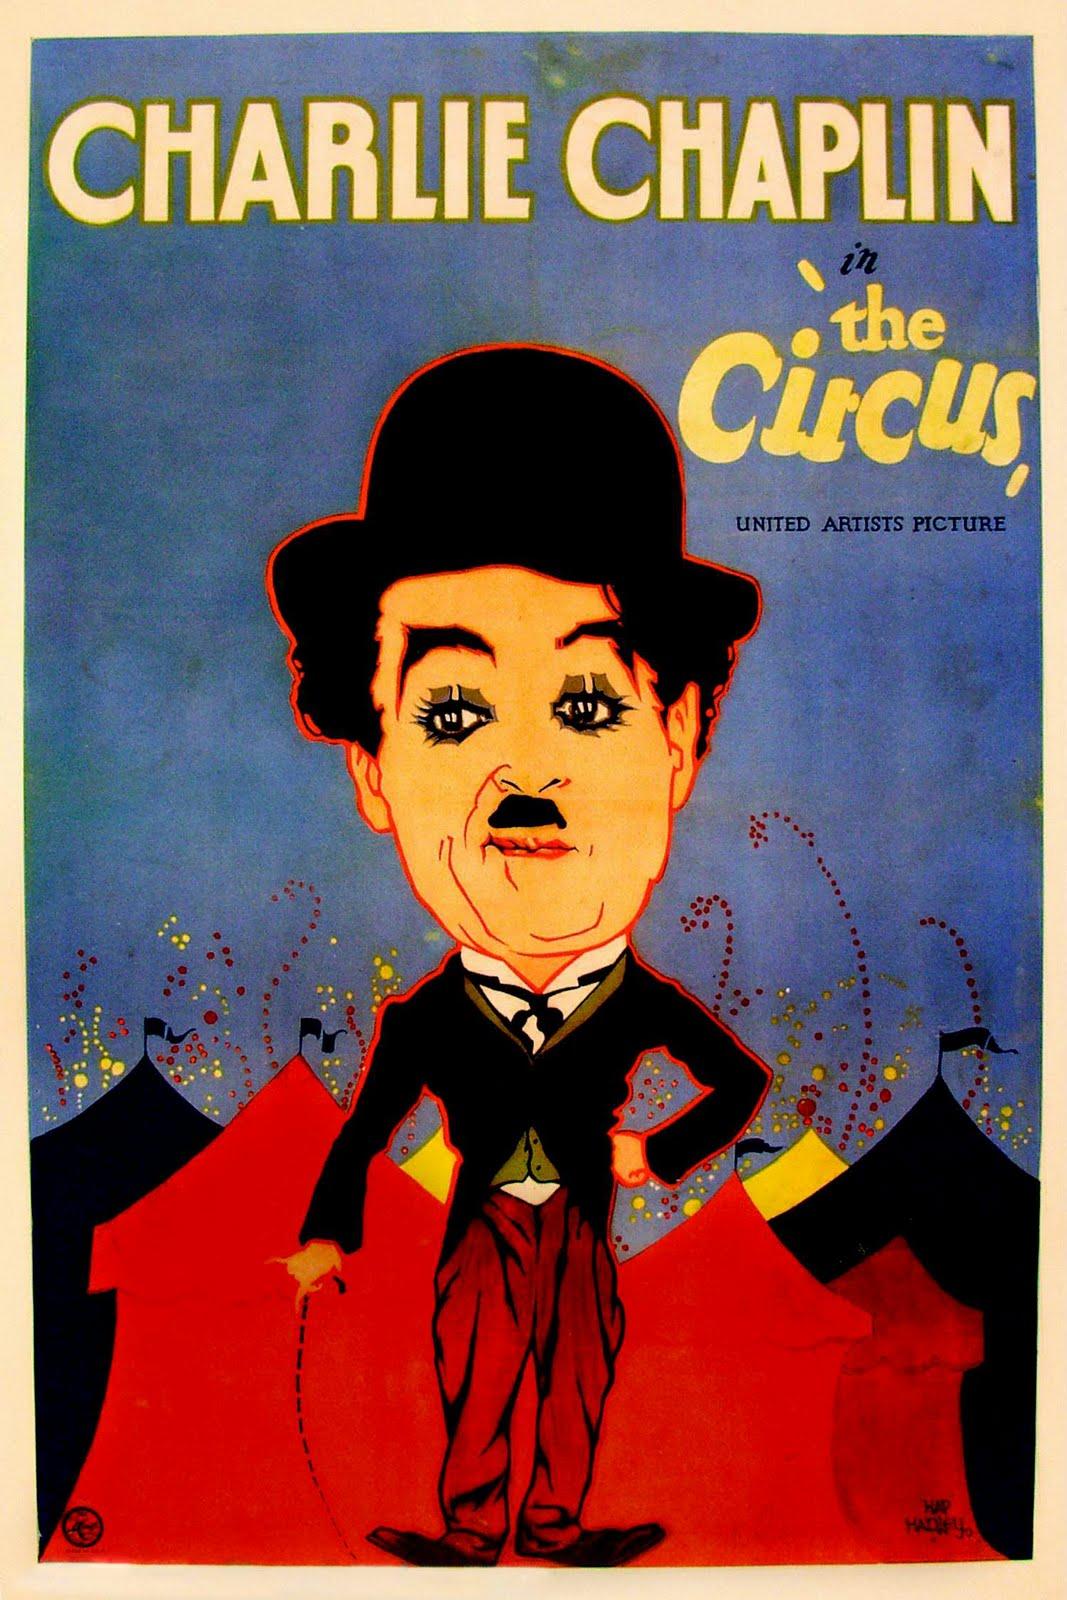 Every Charlie Chaplin Movie: The Circus (1928)